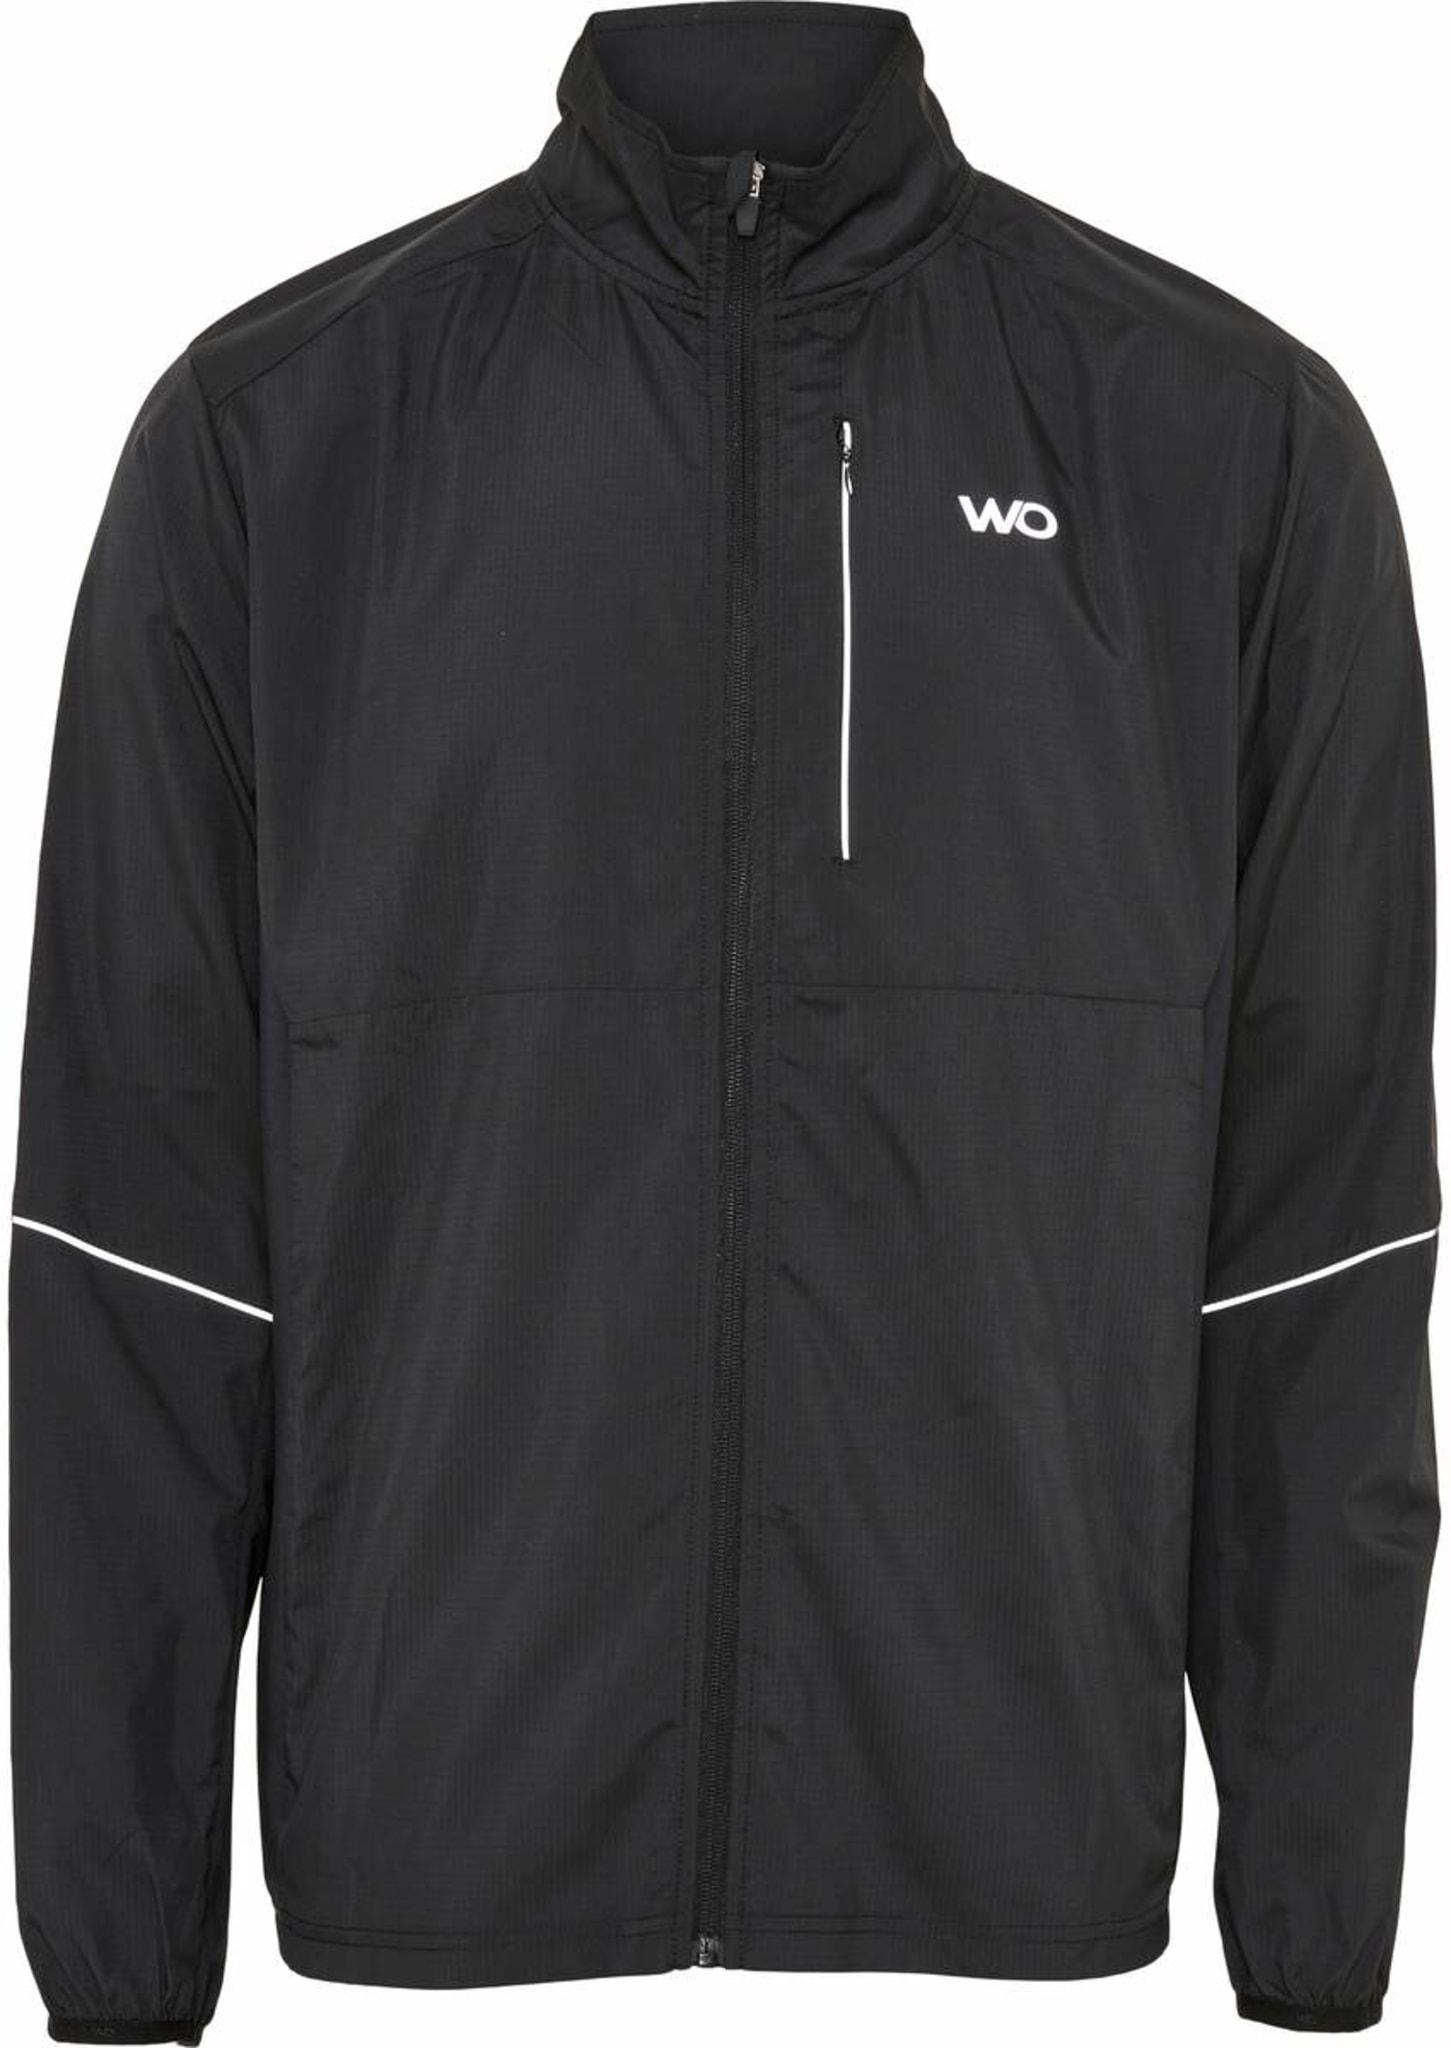 Chander Tech Jacket M